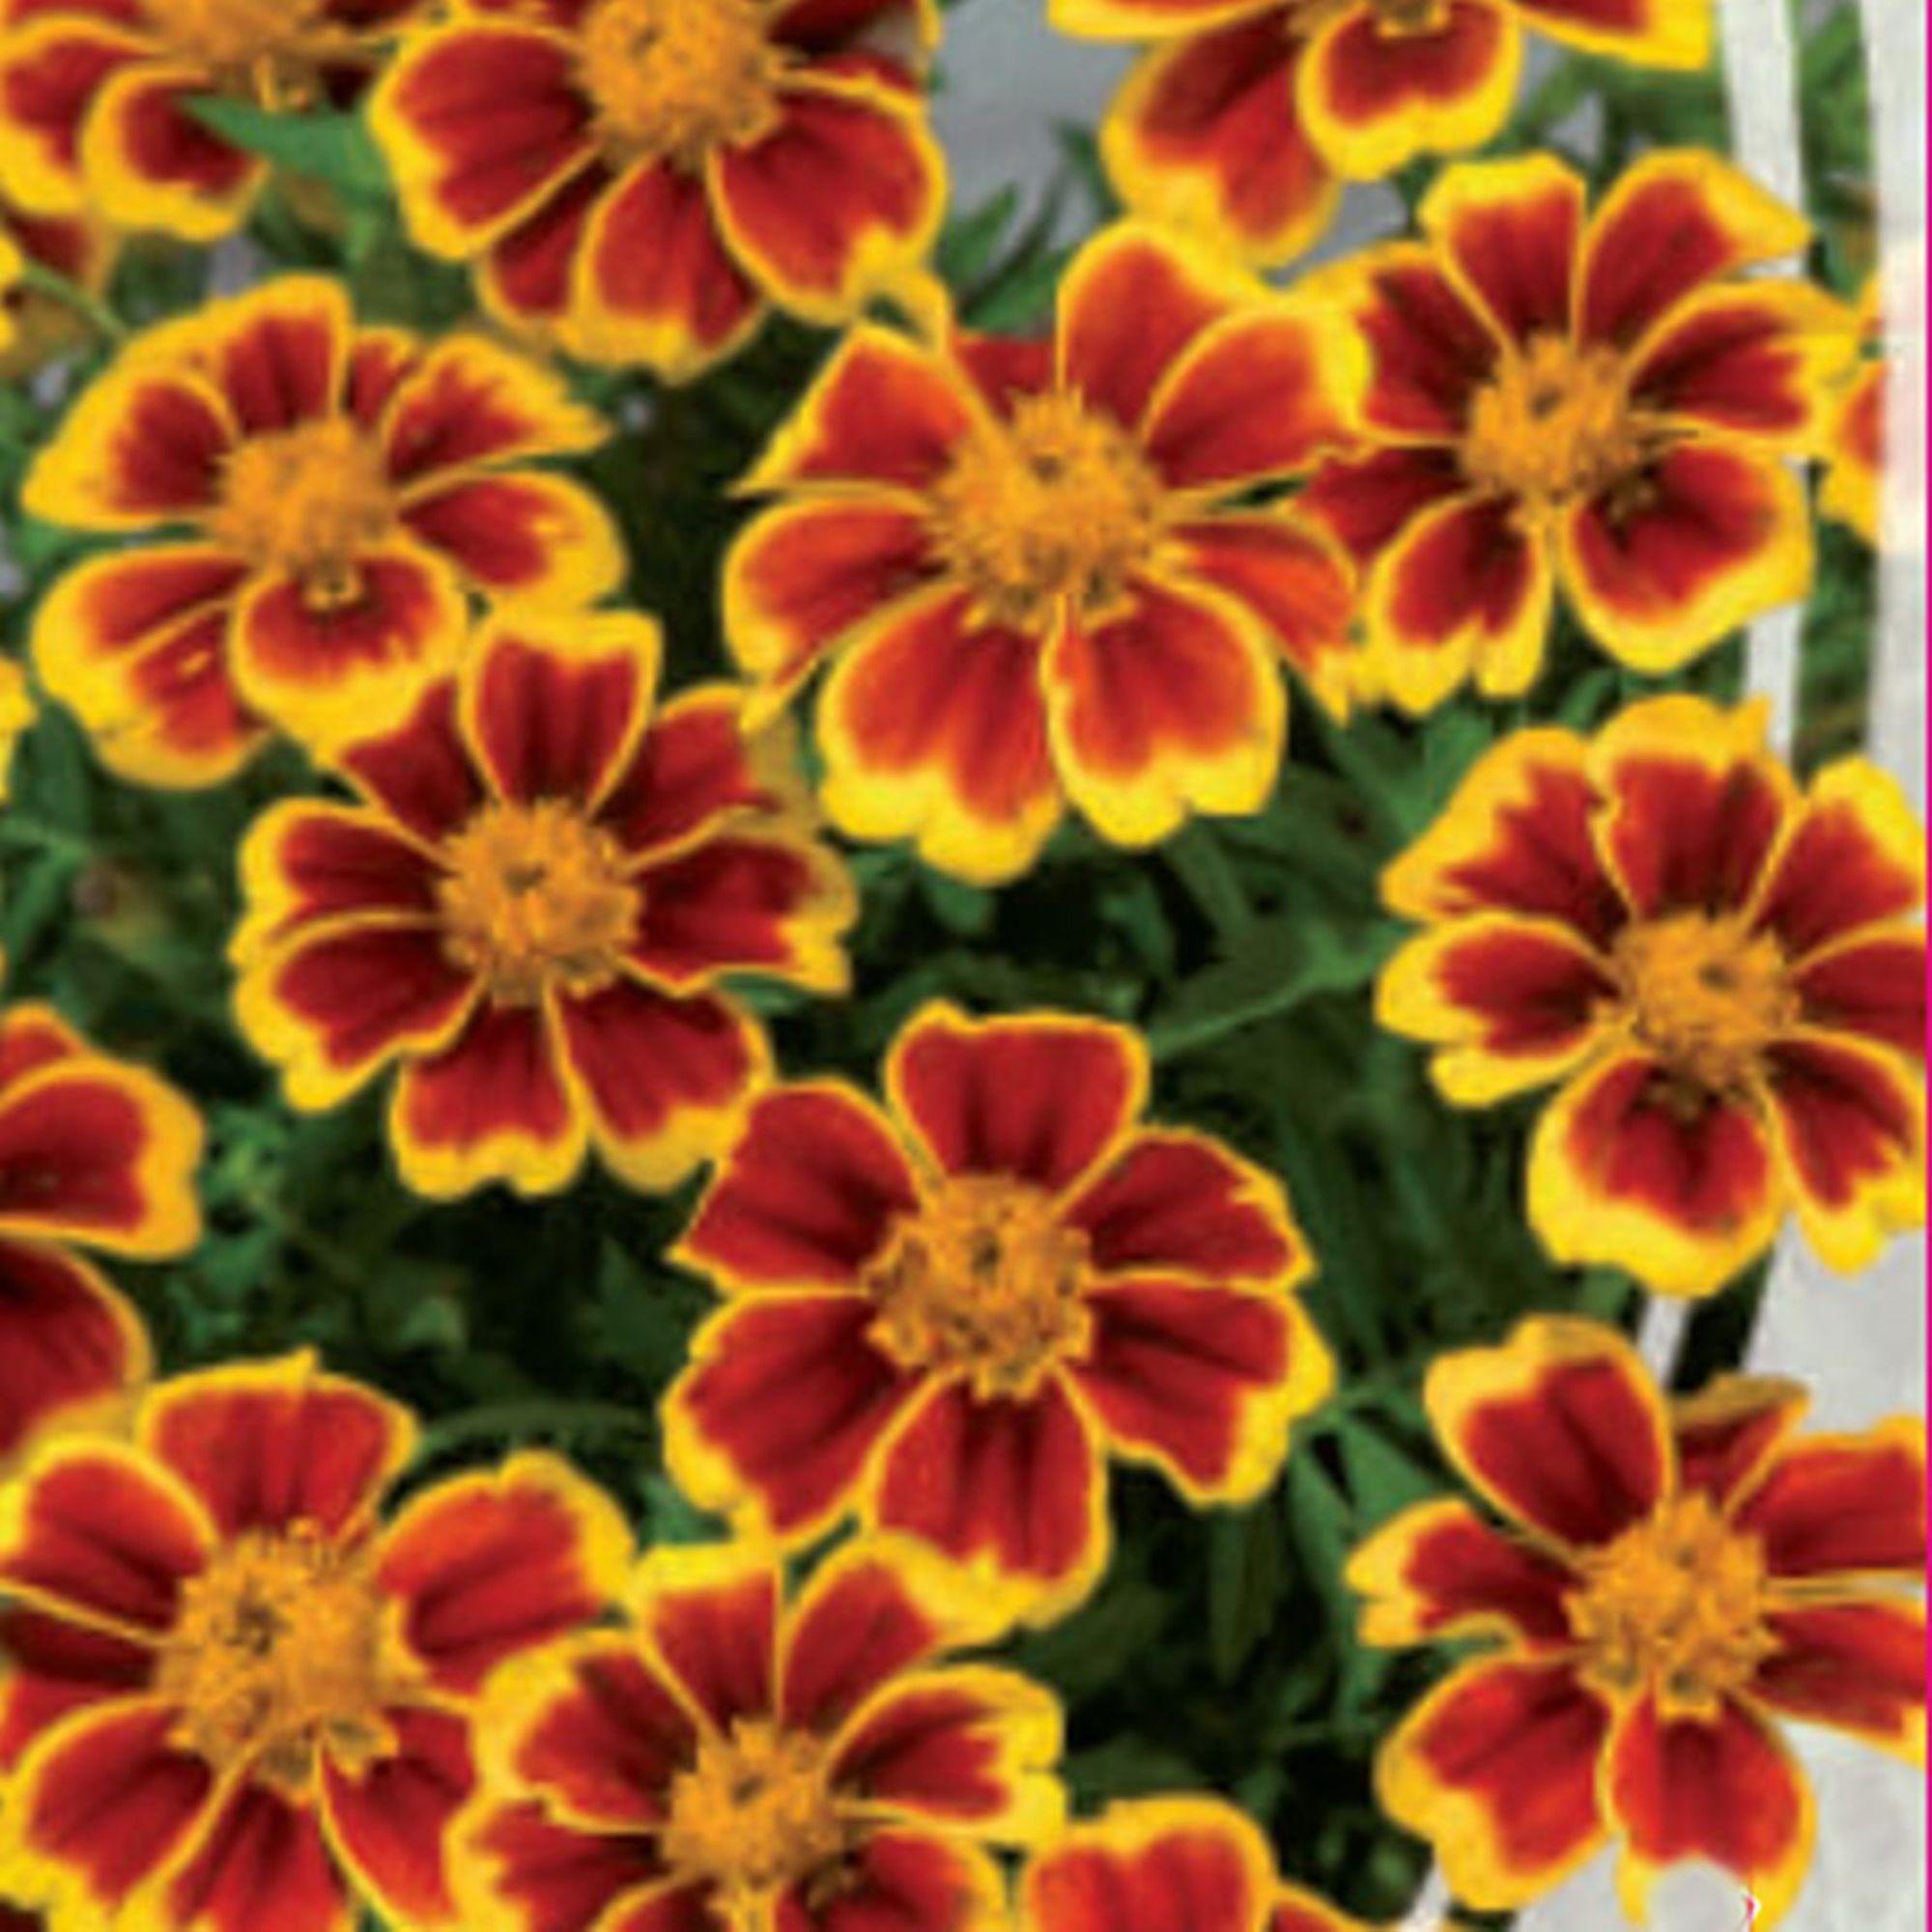 Tagetes patula Annual Flower Seeds French Marigold Marietta